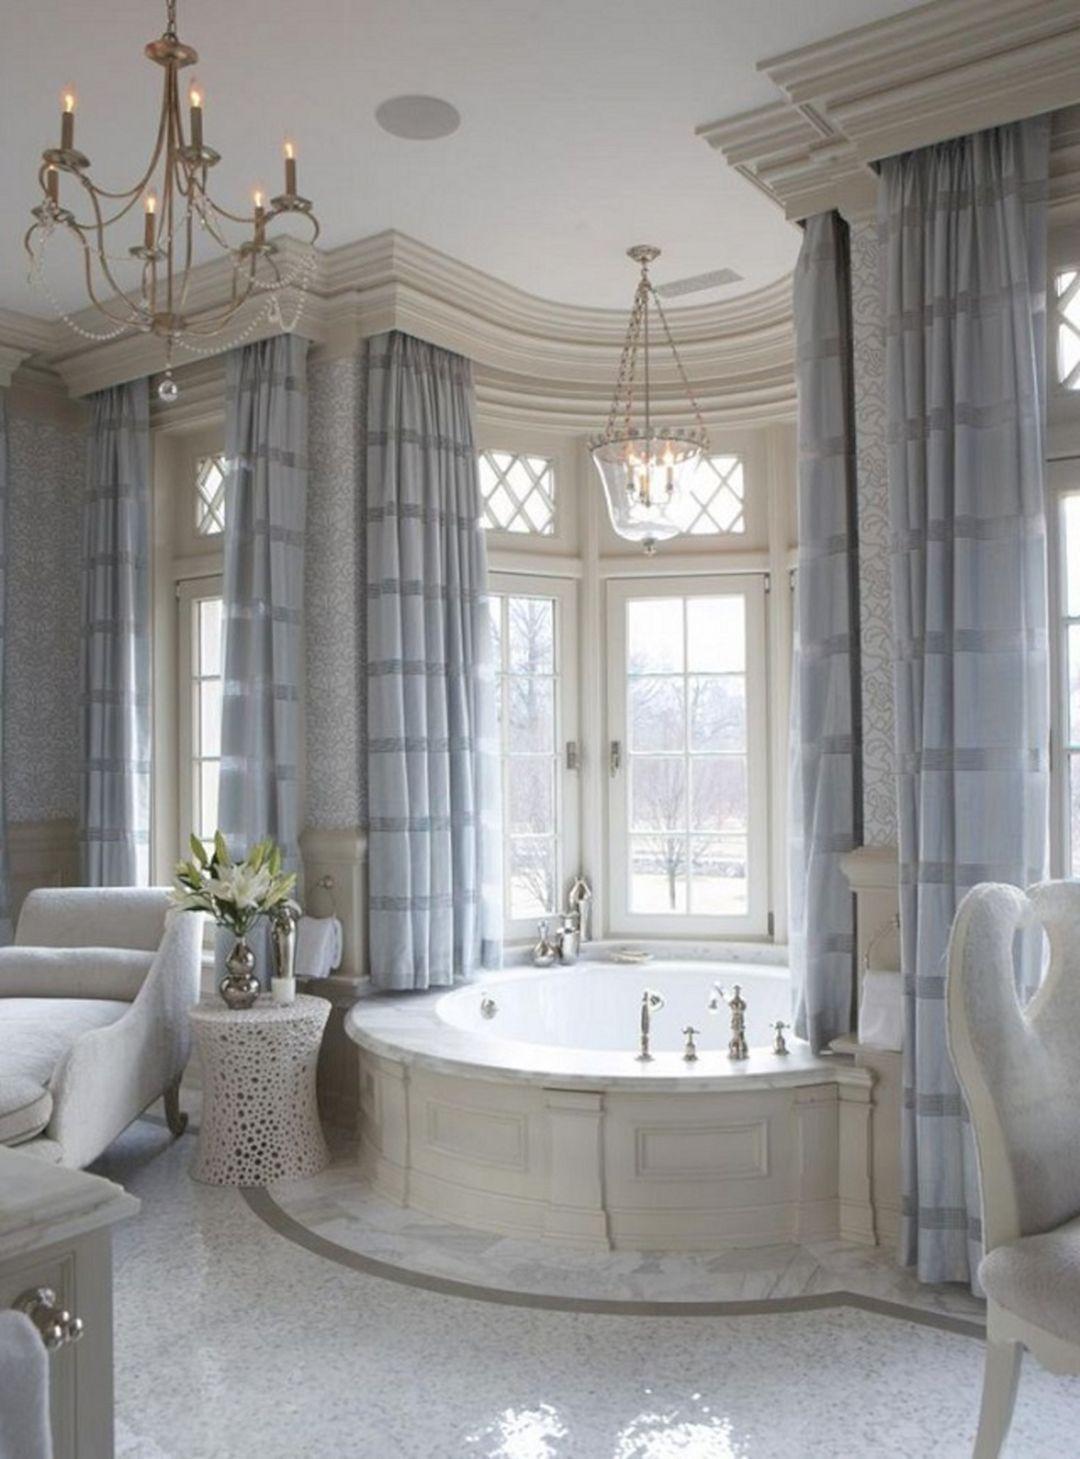 Wonderful Astounding Astonishing 15 Luxurious Master Bathroom Design For Inspiration  Https://freshouz.com